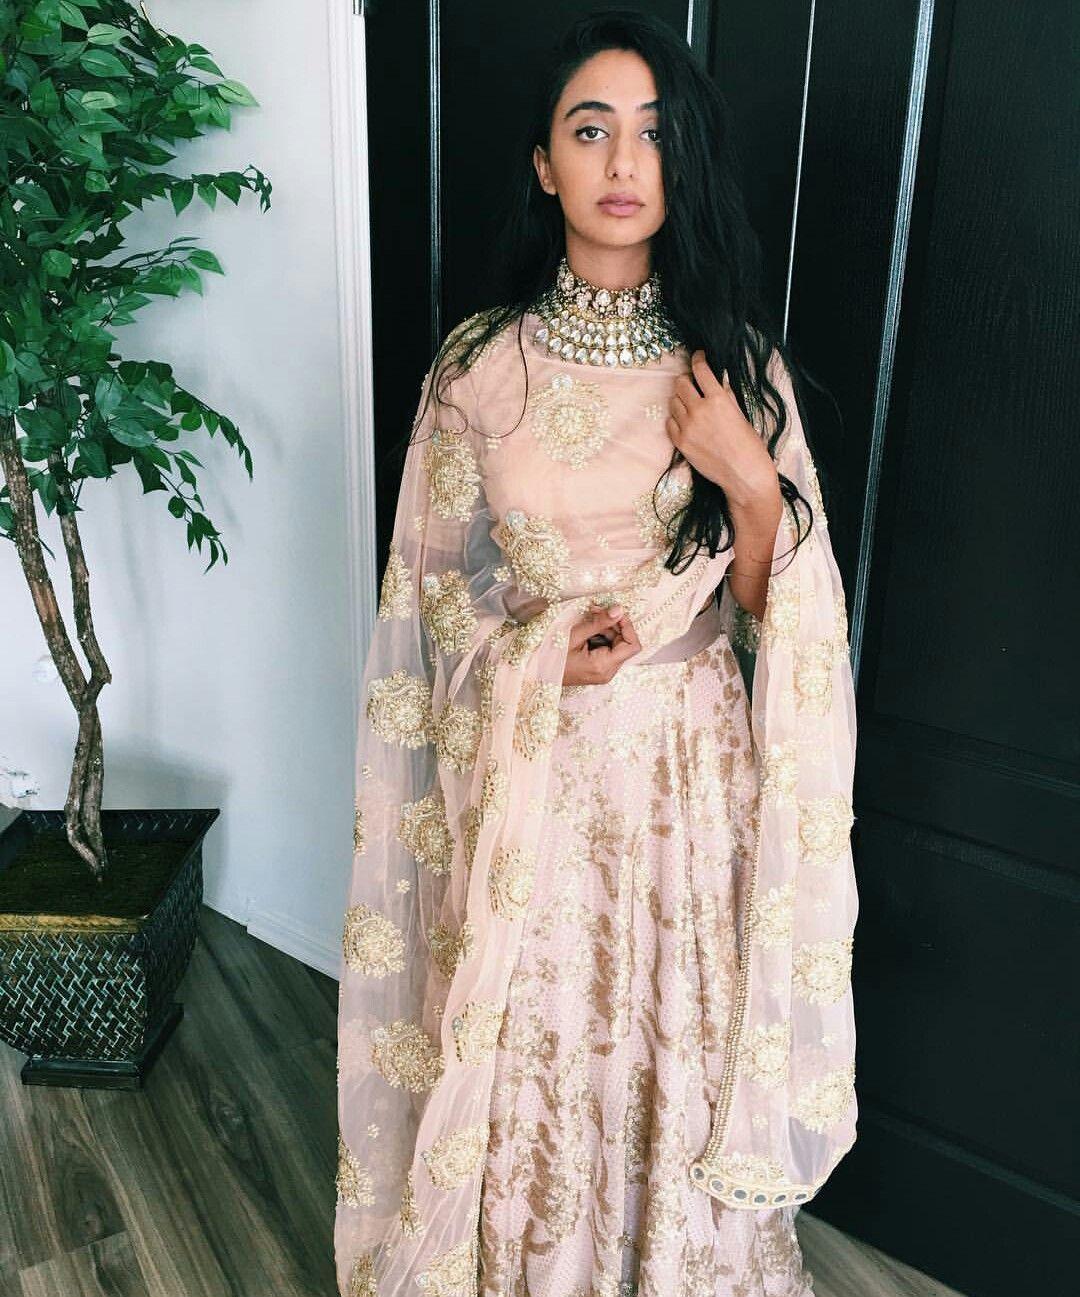 Pin by Anjaani Patel on Traditional | Pinterest | Desi, Indian ...